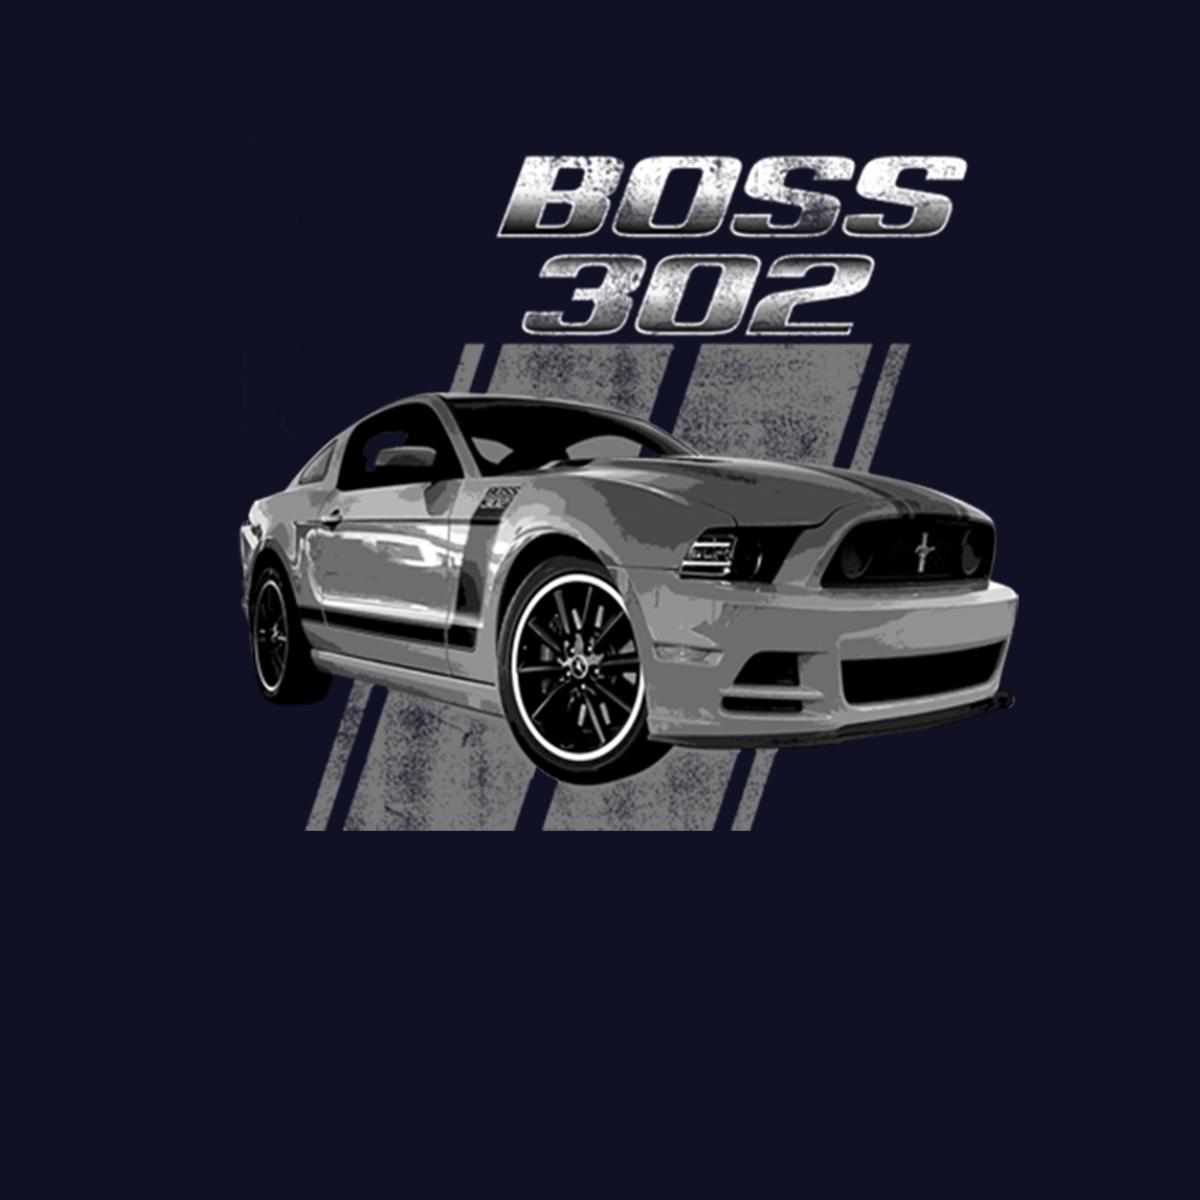 Ford-Mustang-50-Years-Boss-302-Men-T-shirt-XS-5XL thumbnail 6